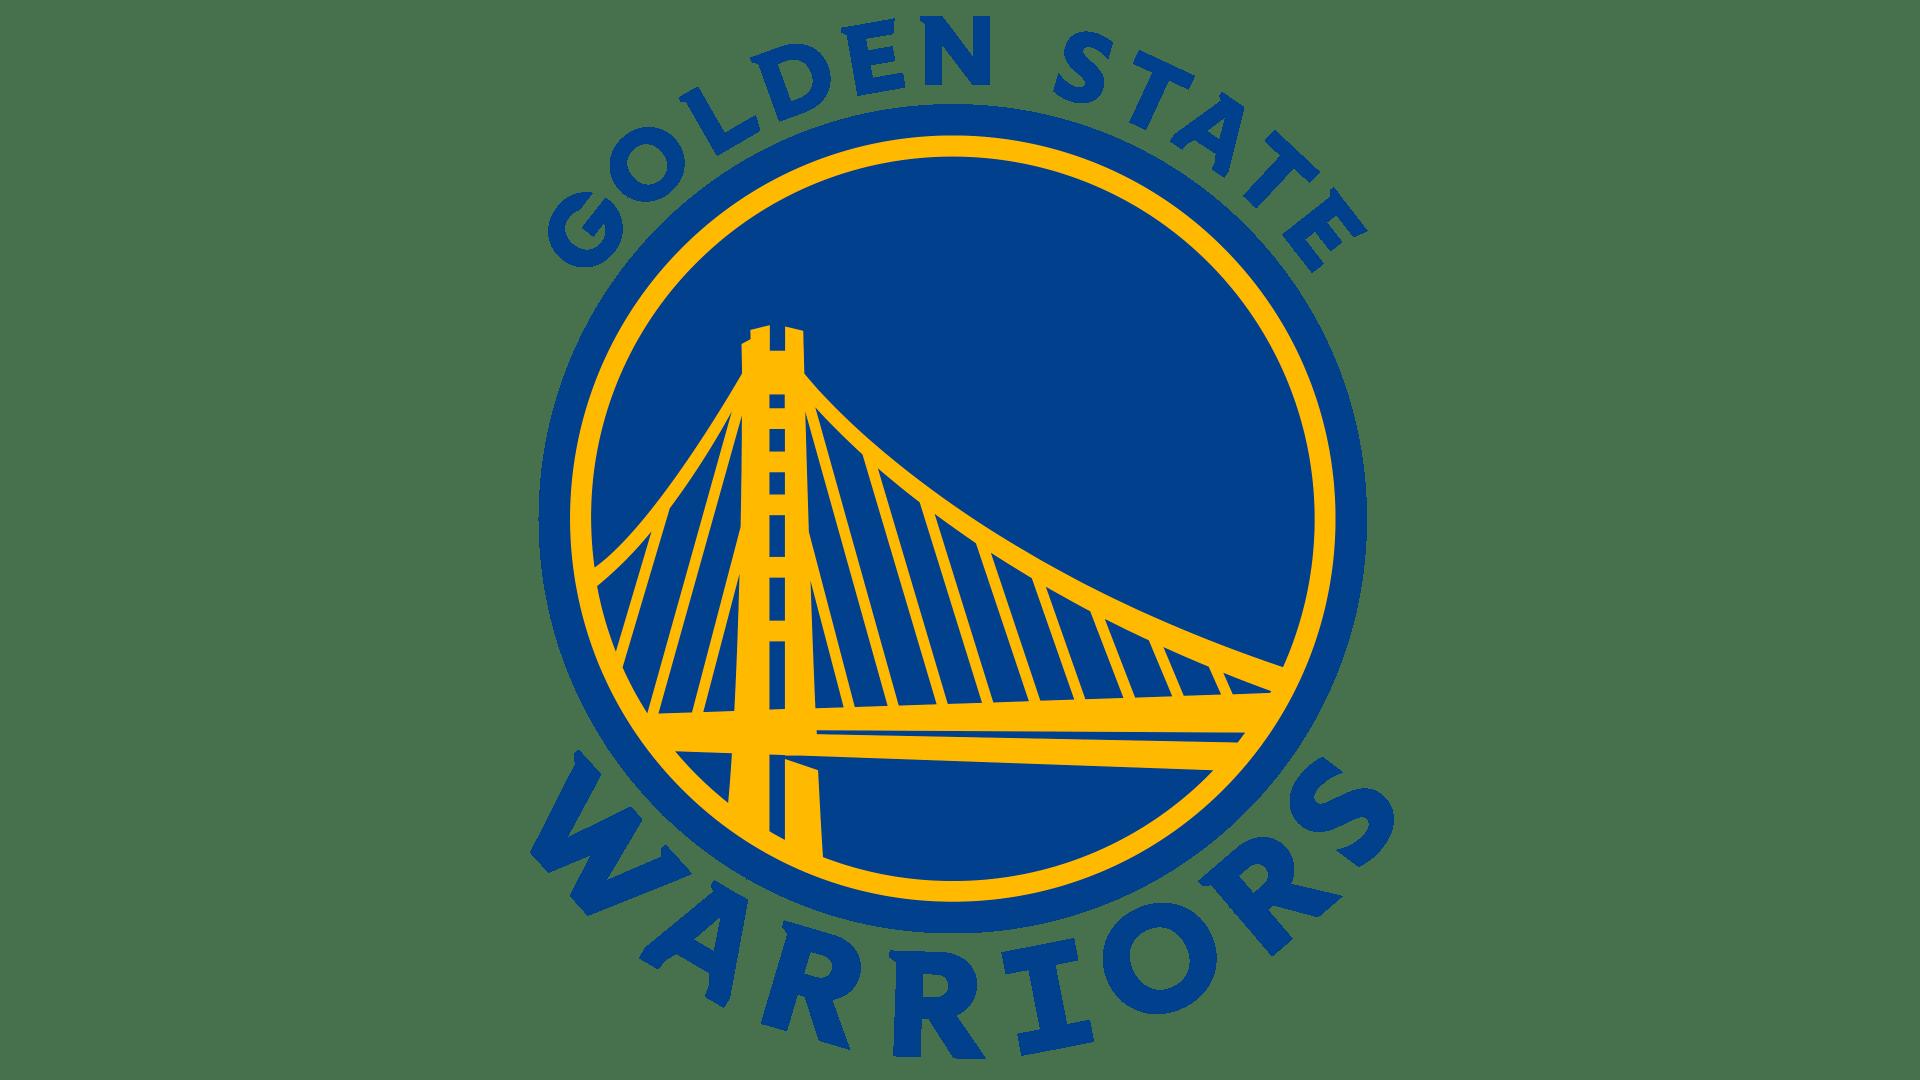 Modnyj rejting klubnyh emblem NBA 28. Golden State Warriors